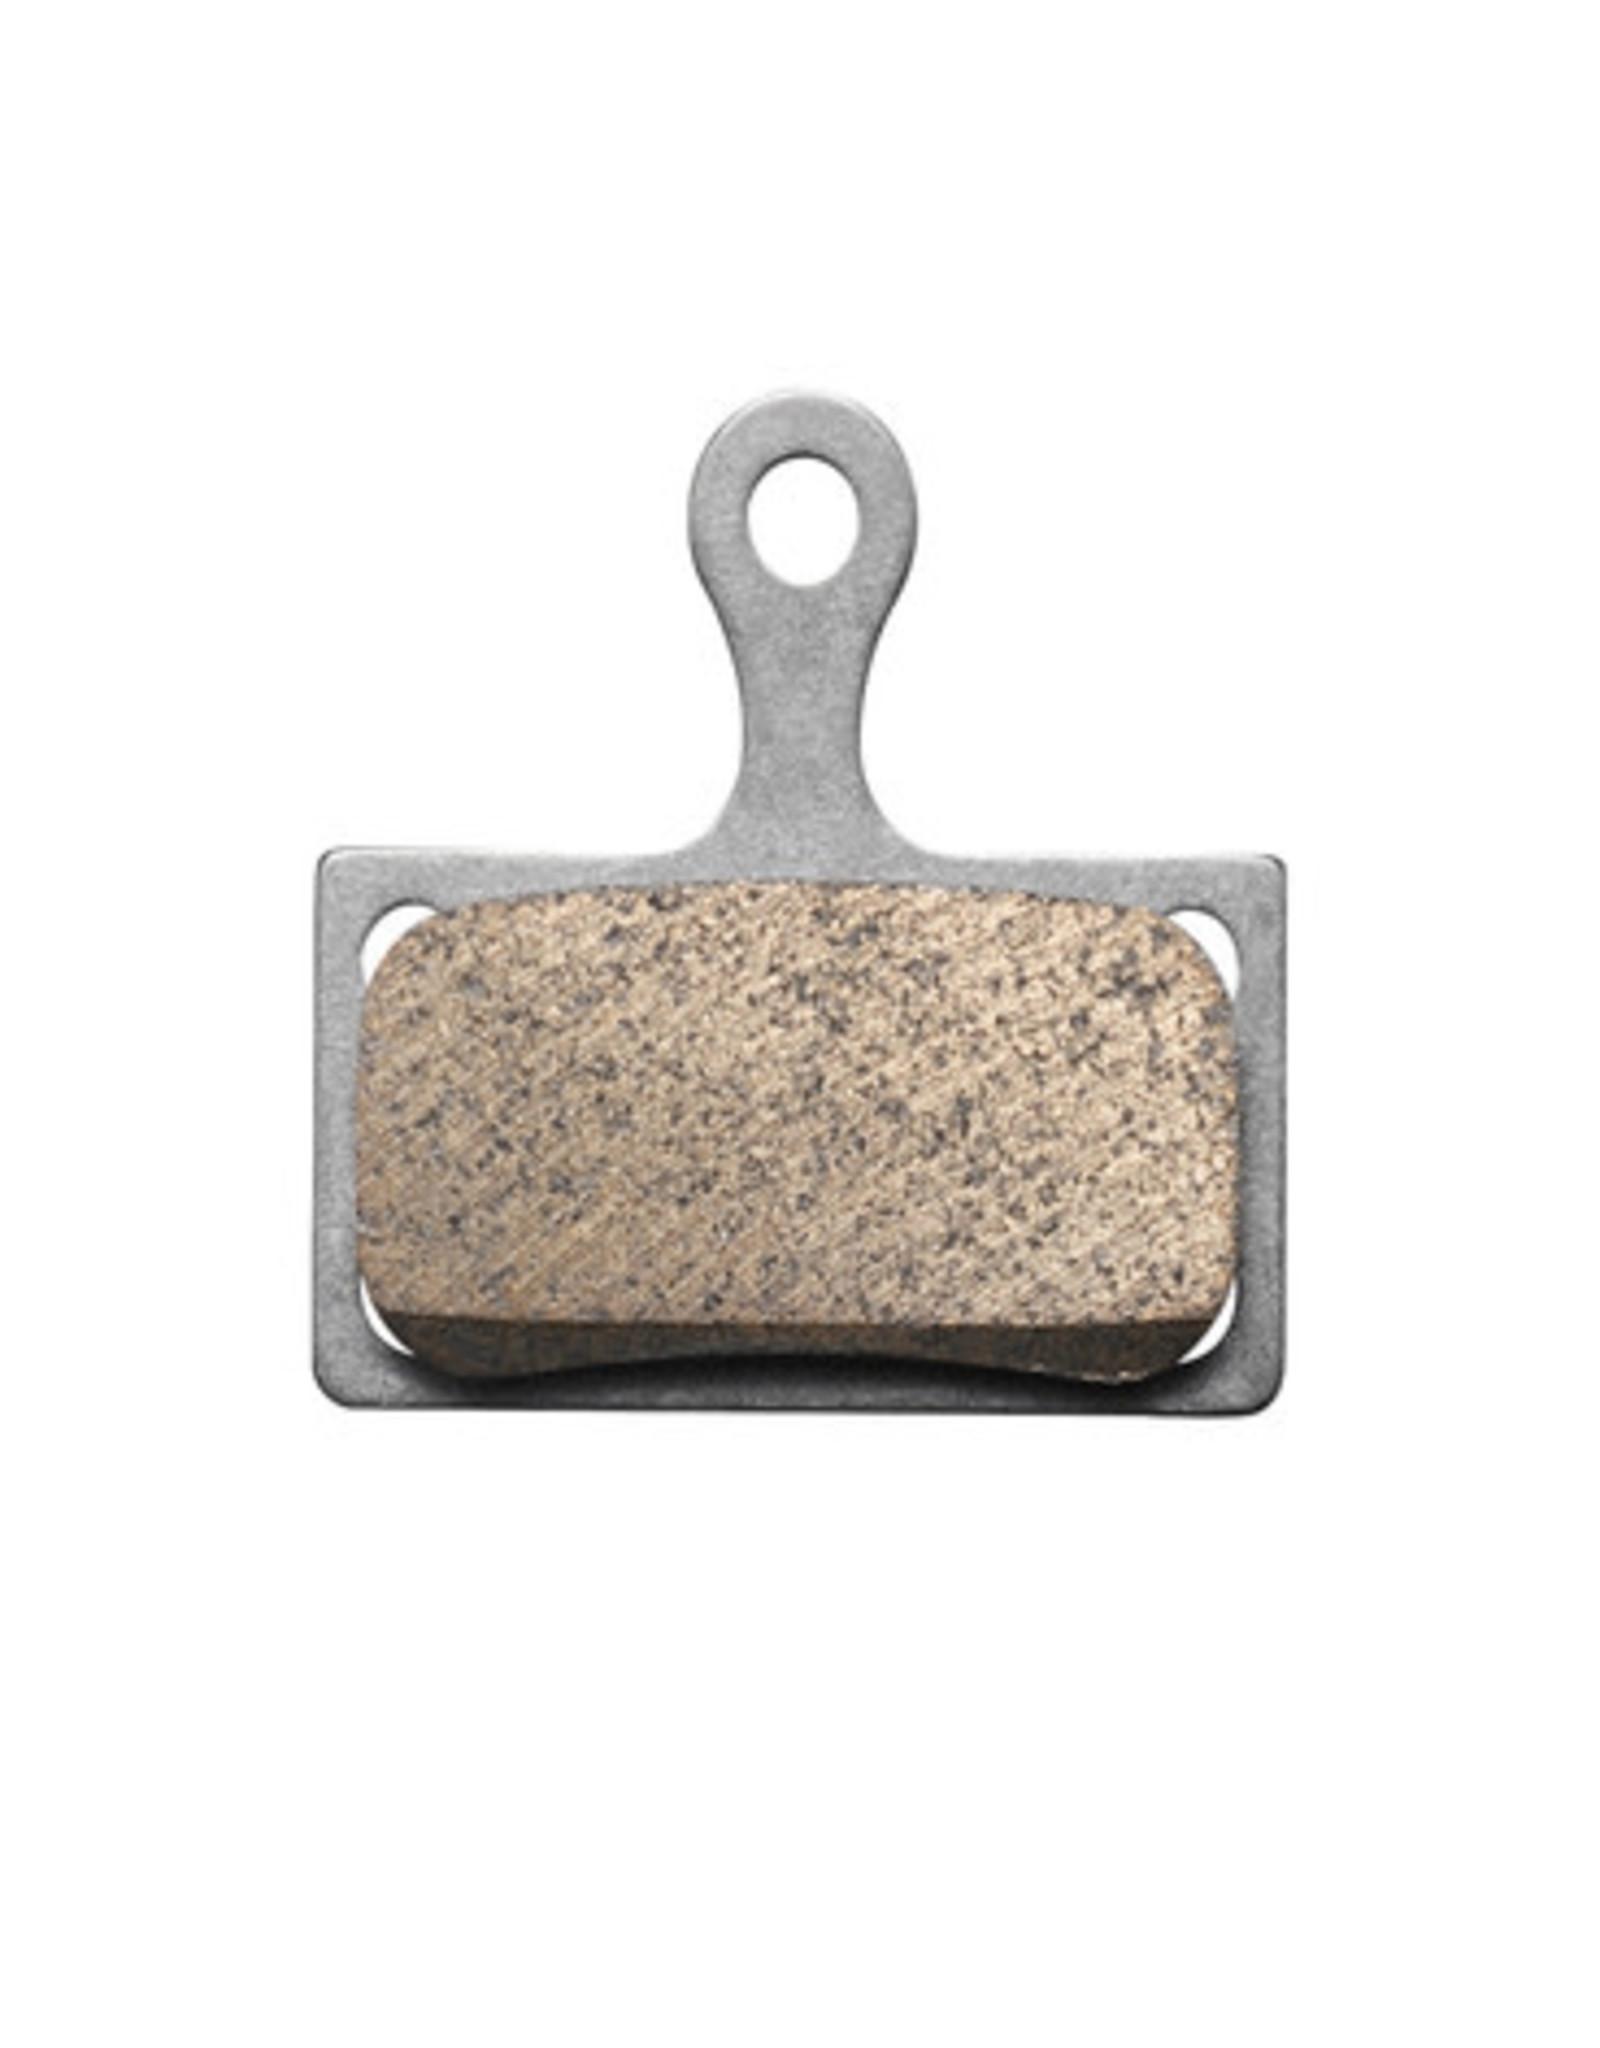 Shimano Brake pads Shim G04S metal (Deore,XT,SLX,Alfine)